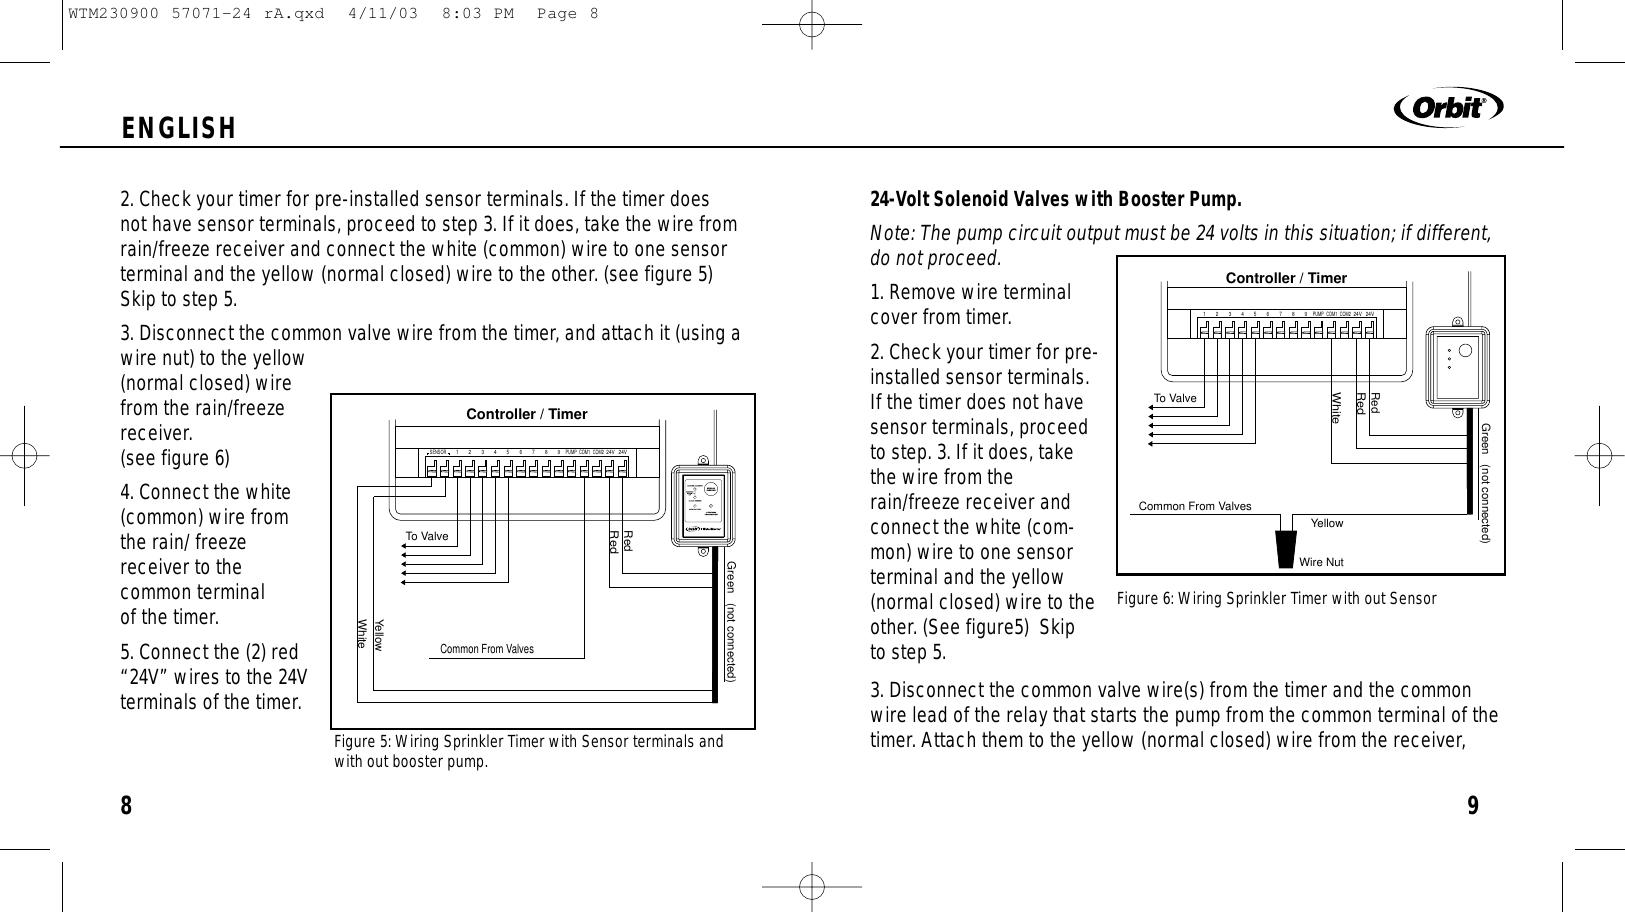 Orbit Sprinkler Timer 57896 Manual Wiring Diagram